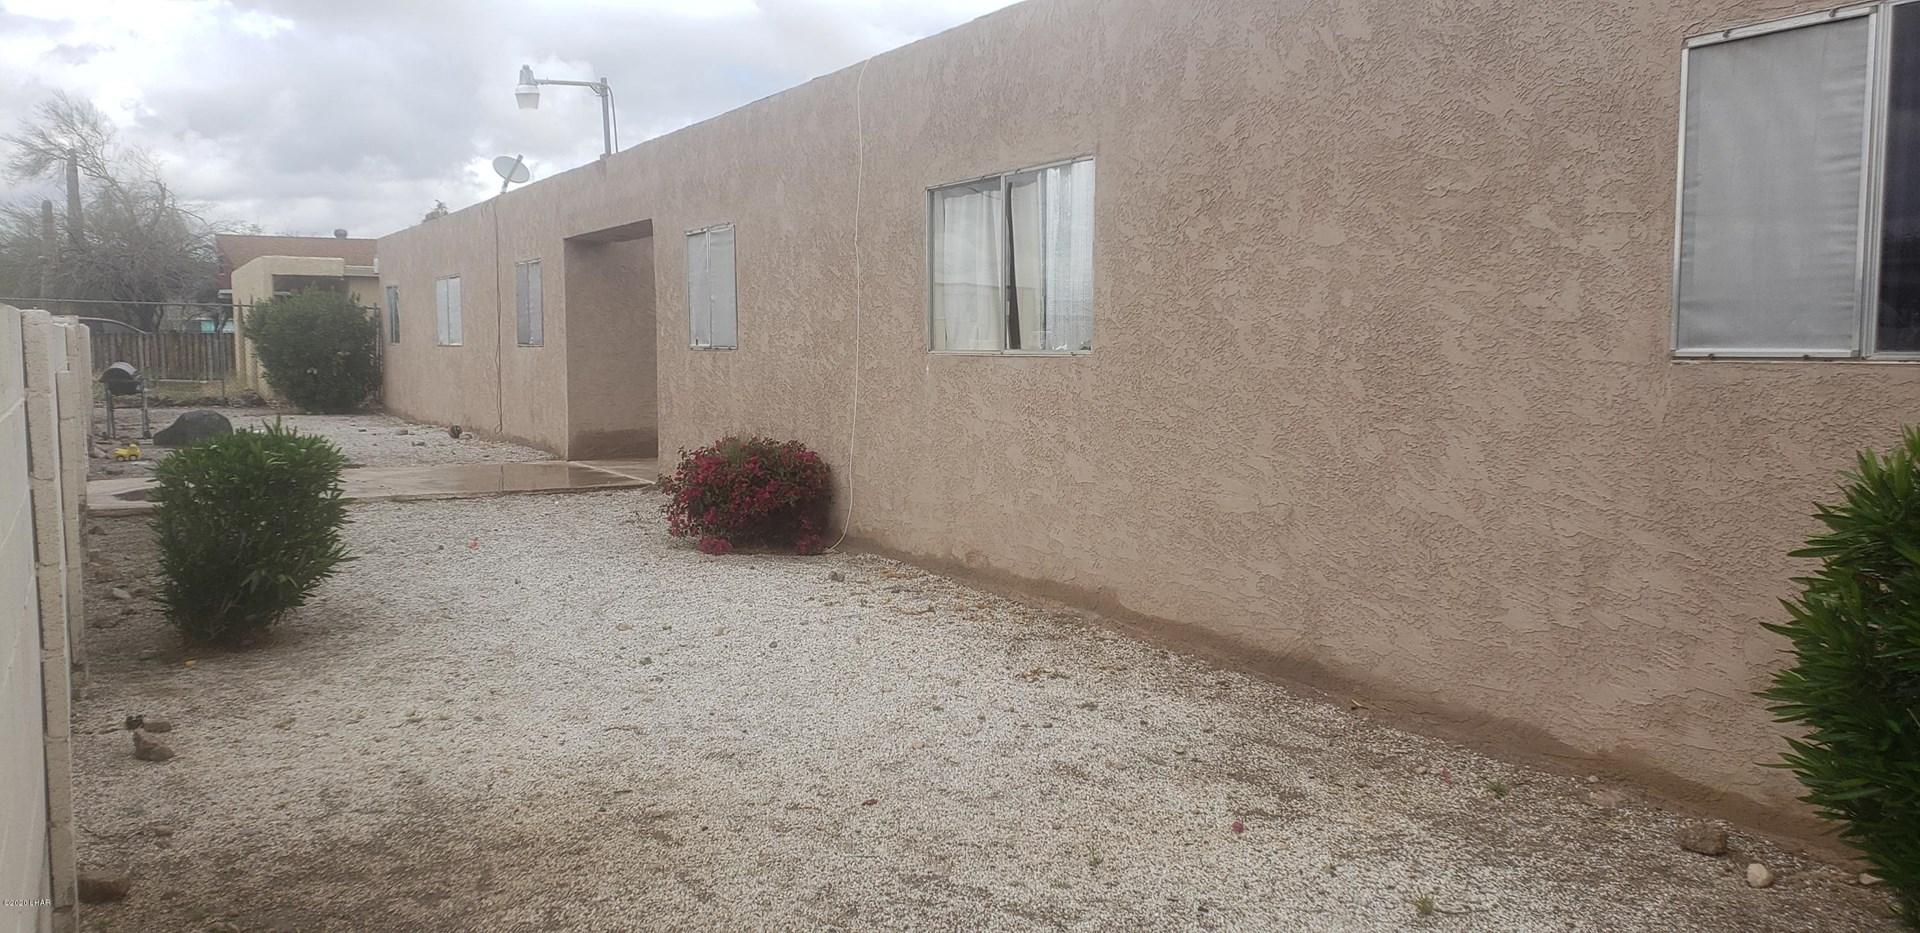 Parker Arizona Investment Property 8 Unit Apartment Building